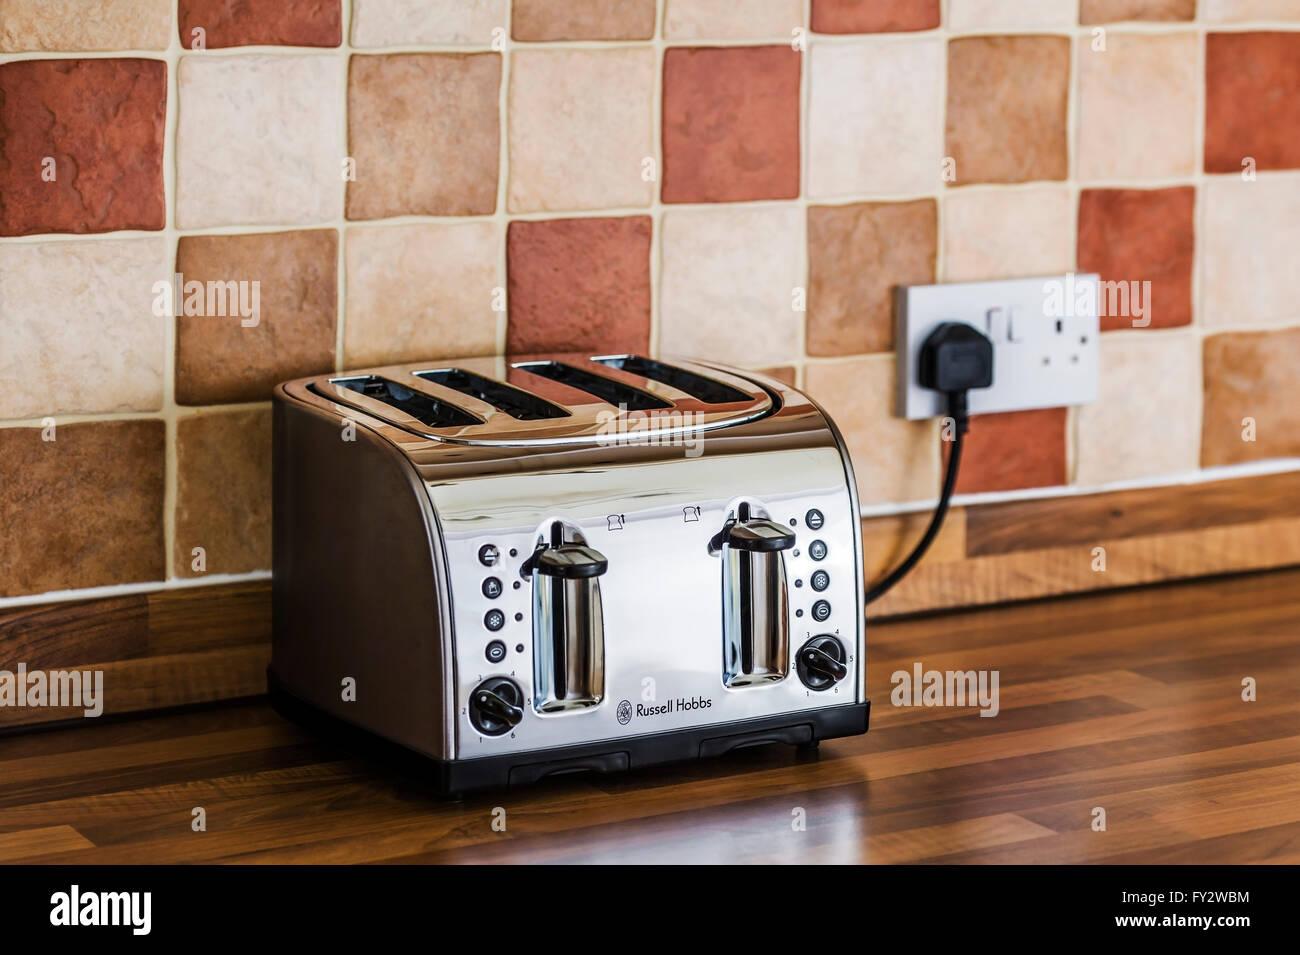 Four Slice Toaster On A Kitchen Counter Stock Photo